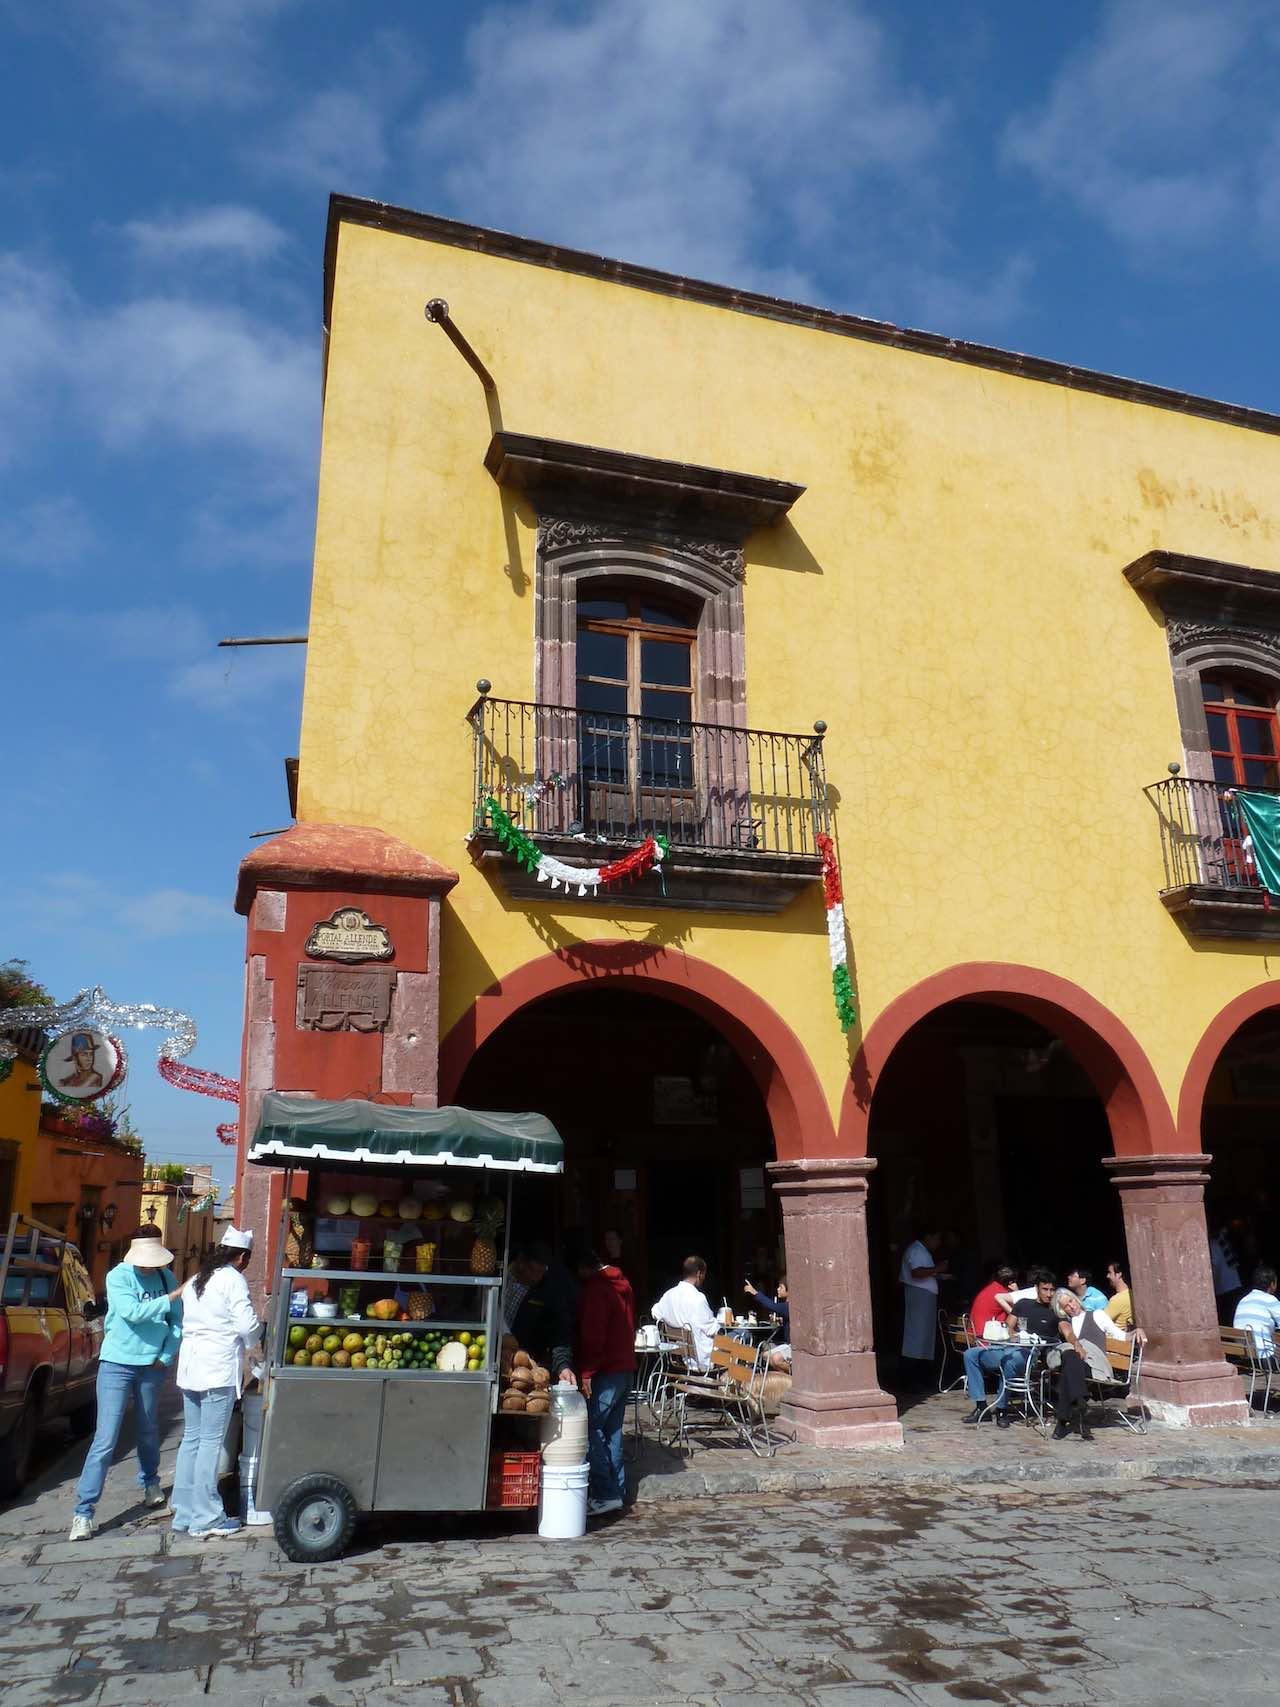 facade of a house in San Miguel de Allende